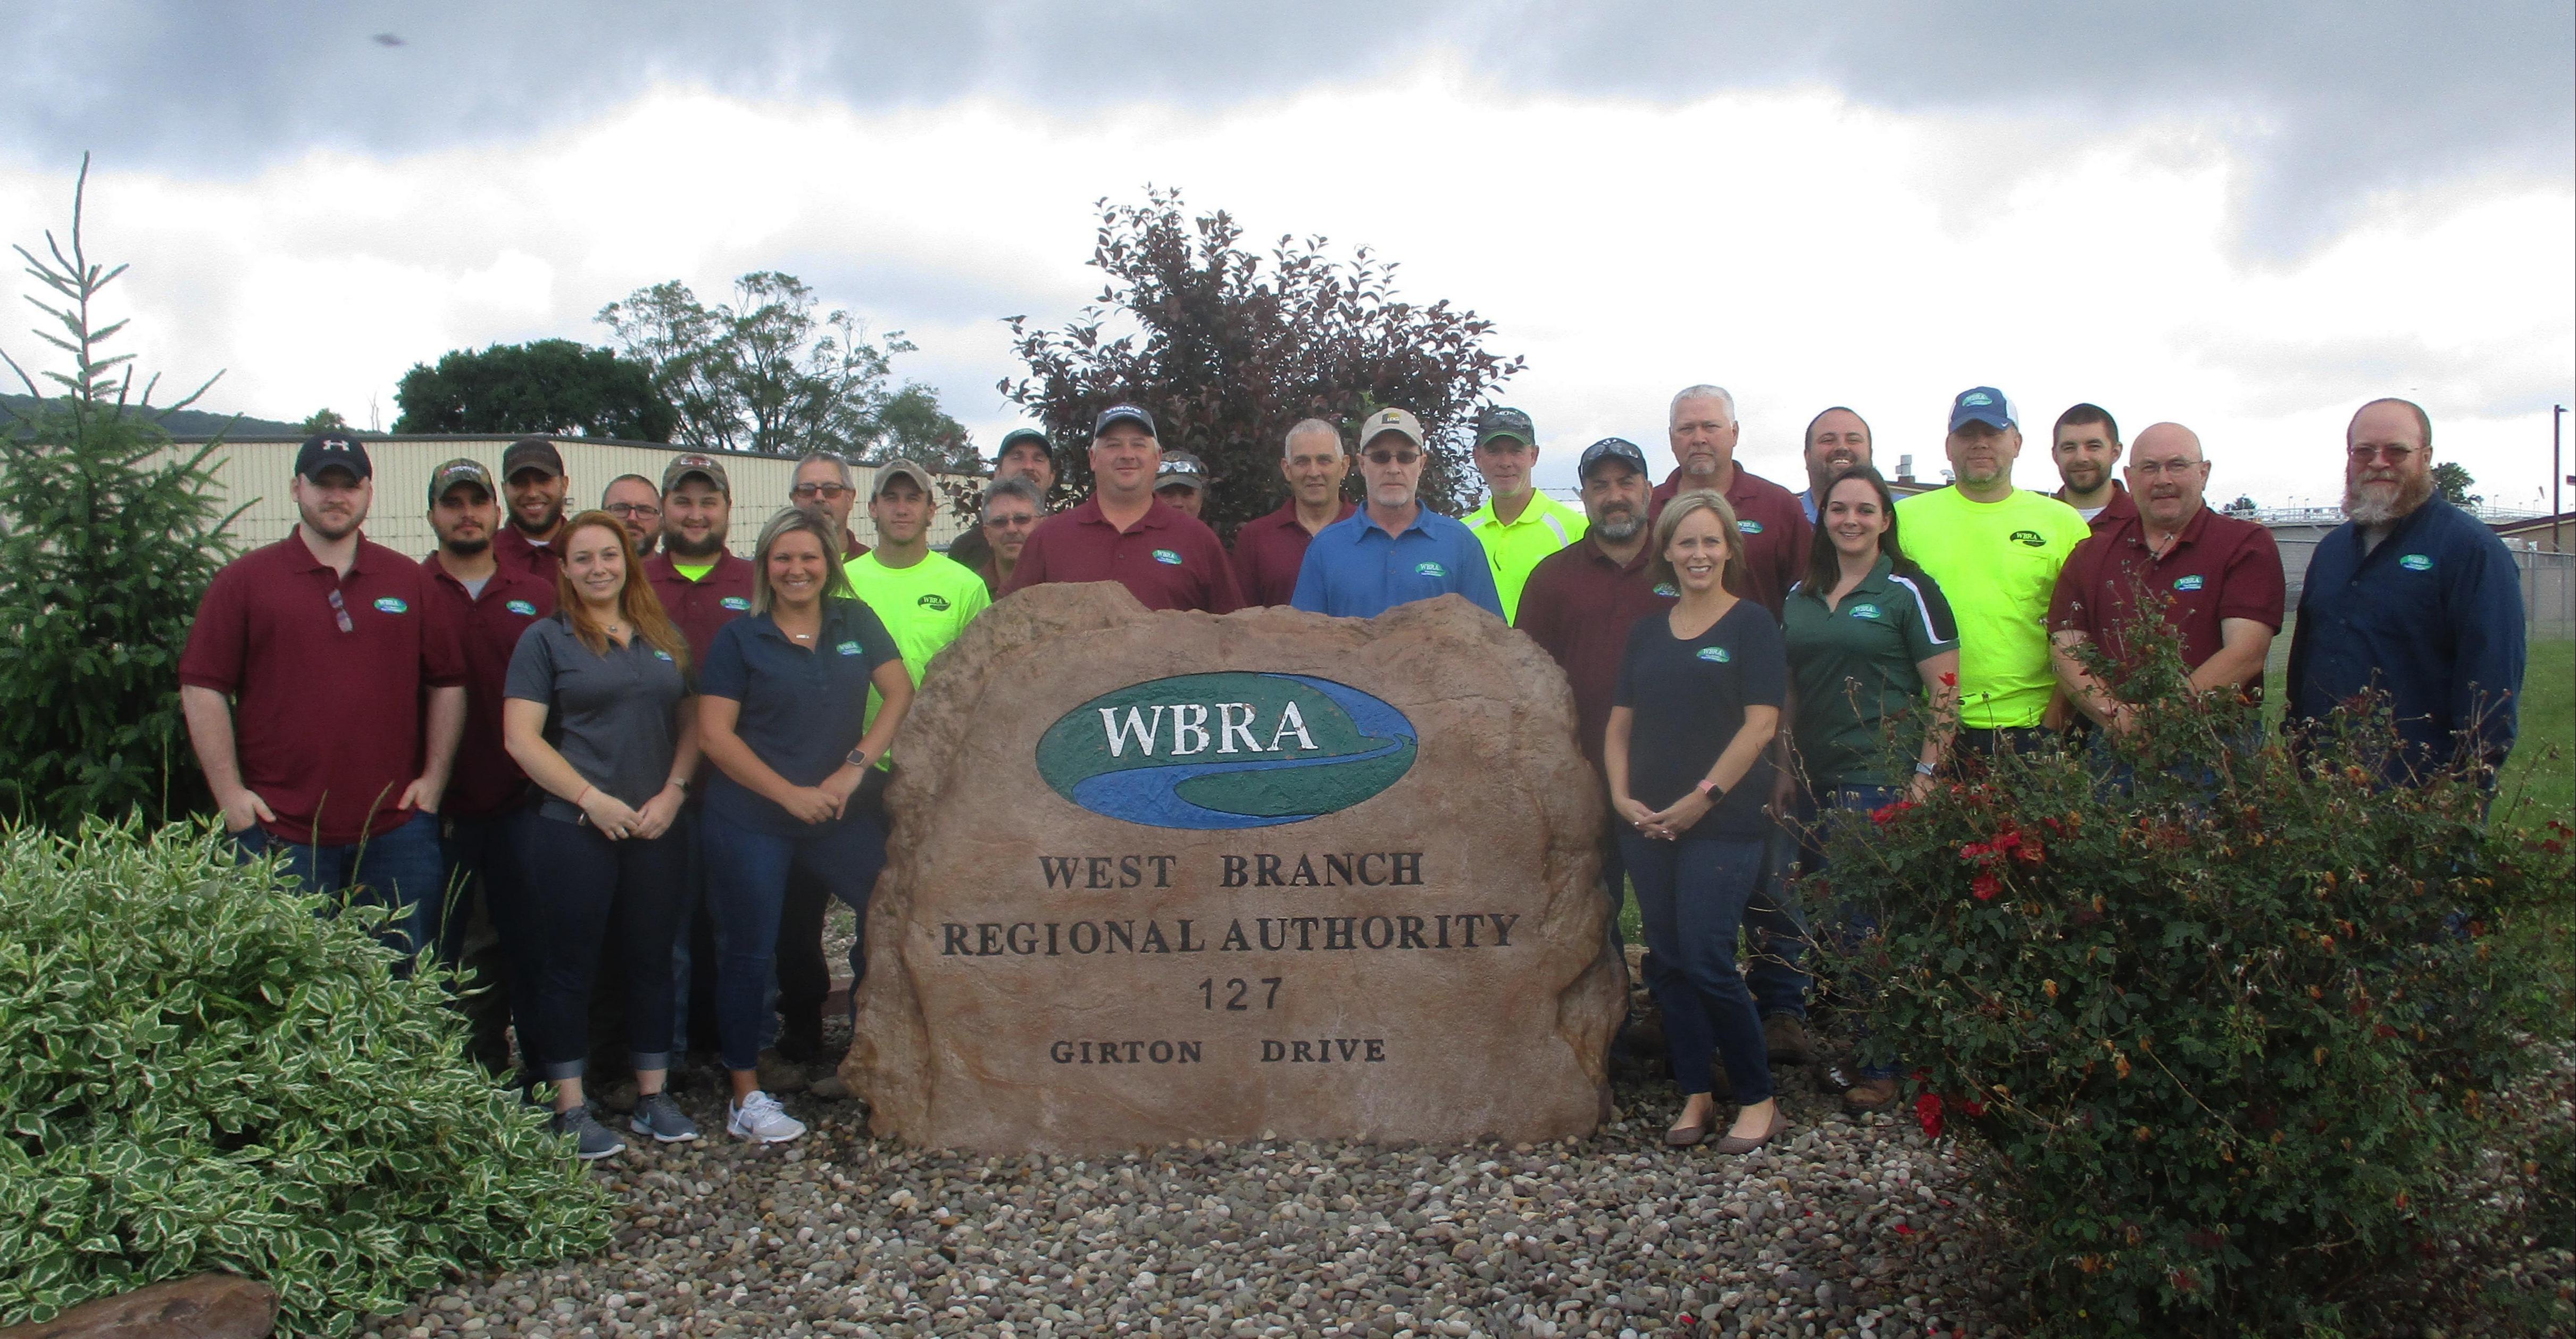 West Branch Regional Authority